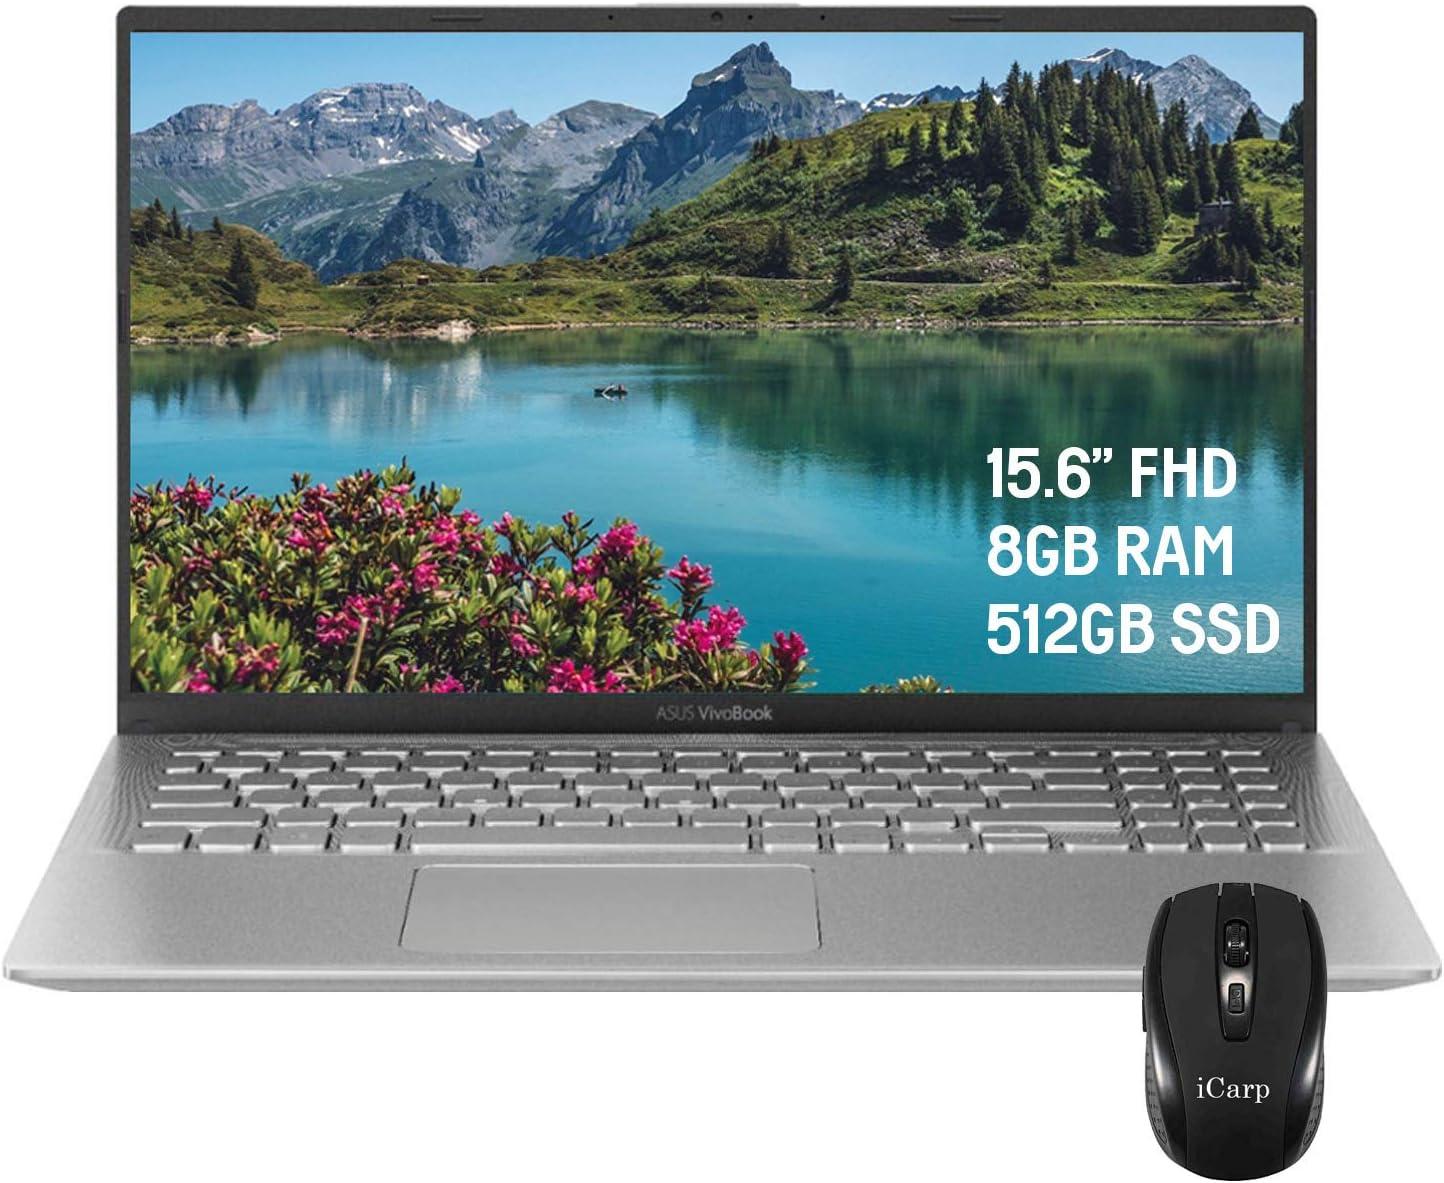 "2020 Flagship ASUS VivoBook X512DA 15 LaptopComputer 15.6"" FHD Display AMD Quad-Core Ryzen 5 3500U (Beats i7-7500U) 8GB DDR4 512GB SSD Webcam AMD Radeon Vega 8 Win 10 Pro + iCarp Wireless Mouse"